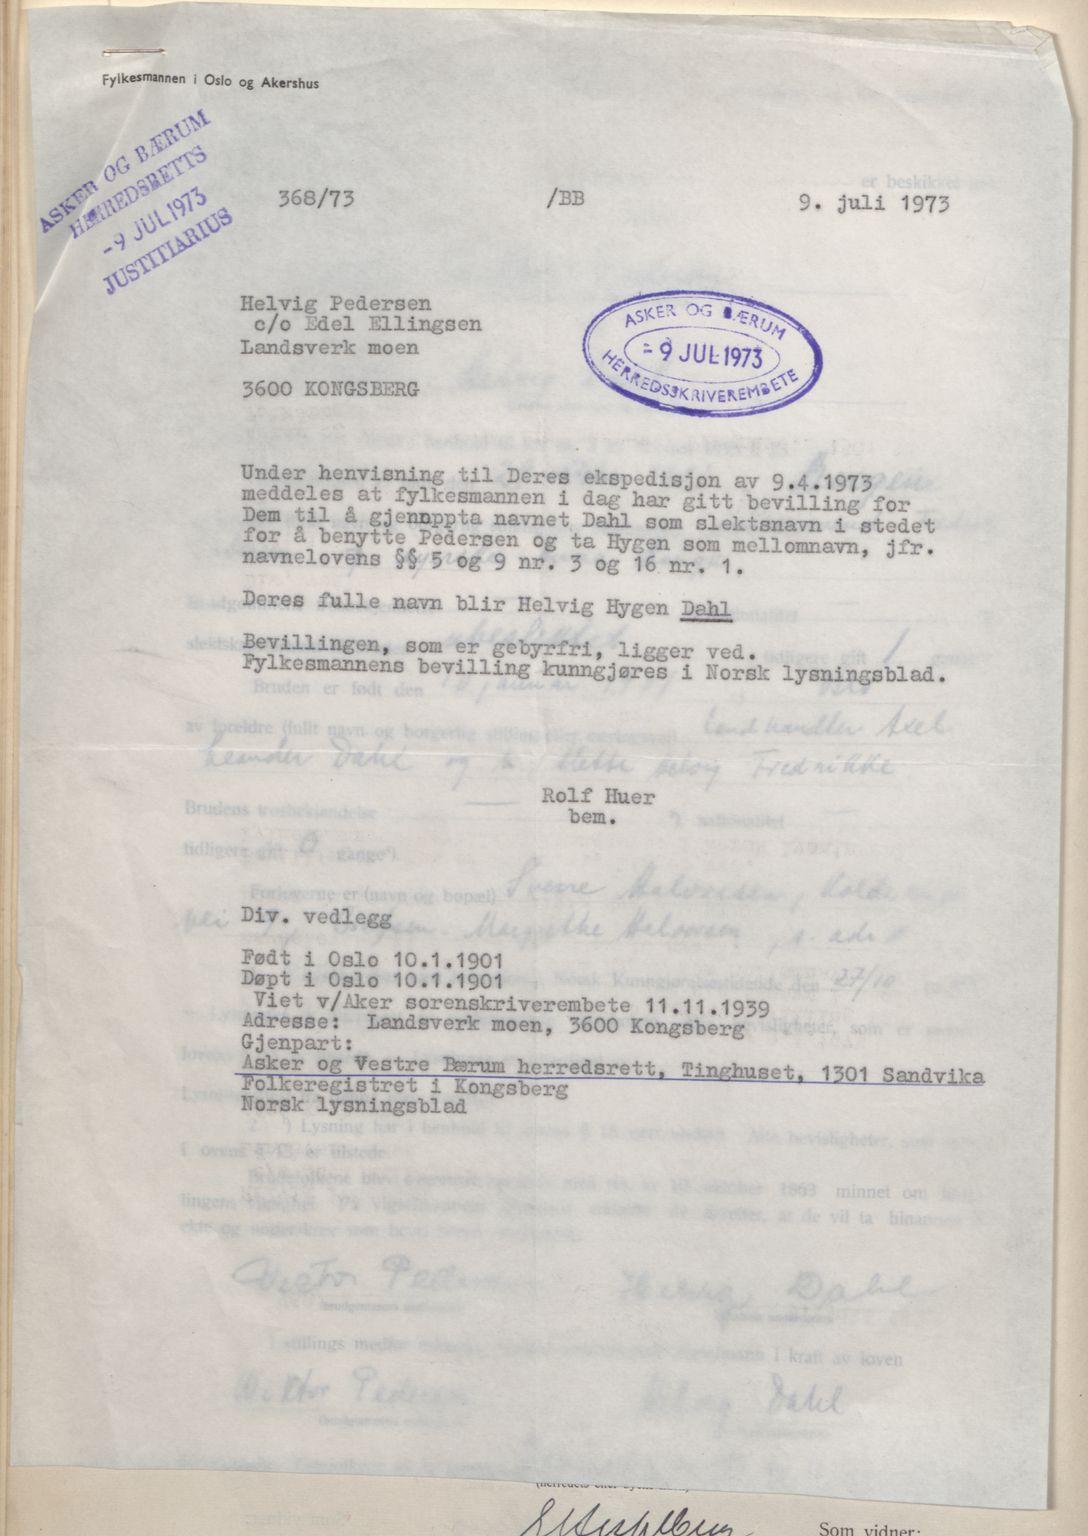 SAO, Aker sorenskriveri, L/Lc/Lcb/L0012: Vigselprotokoll, 1939-1940, s. upaginert